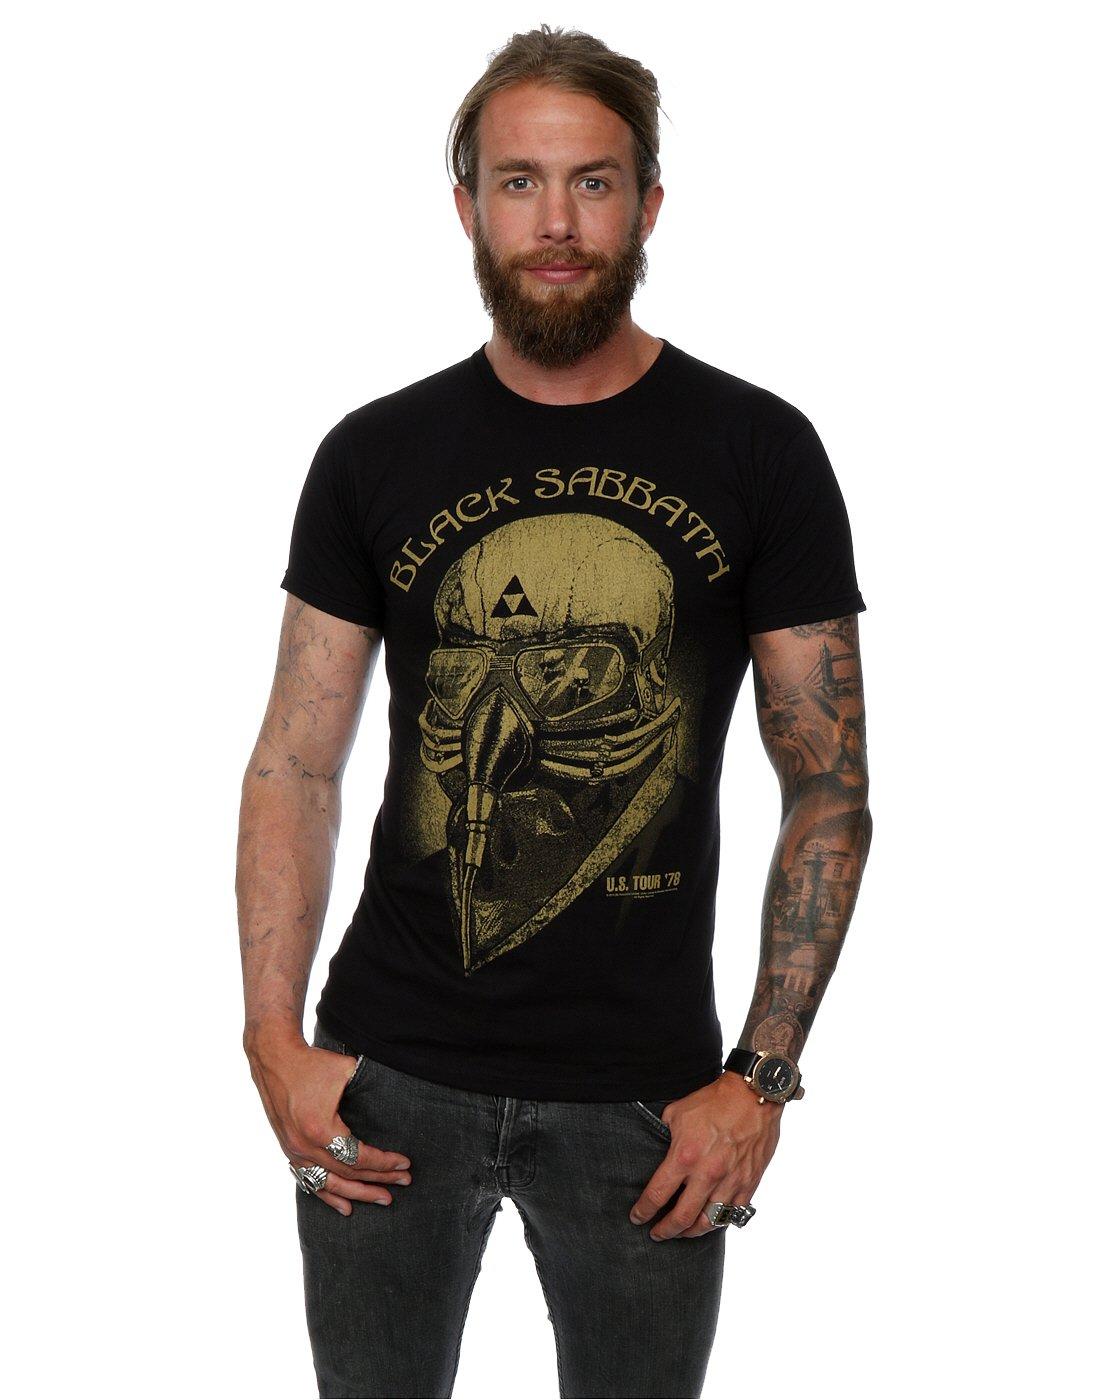 Black Sabbath S Tour 78 Tshirt